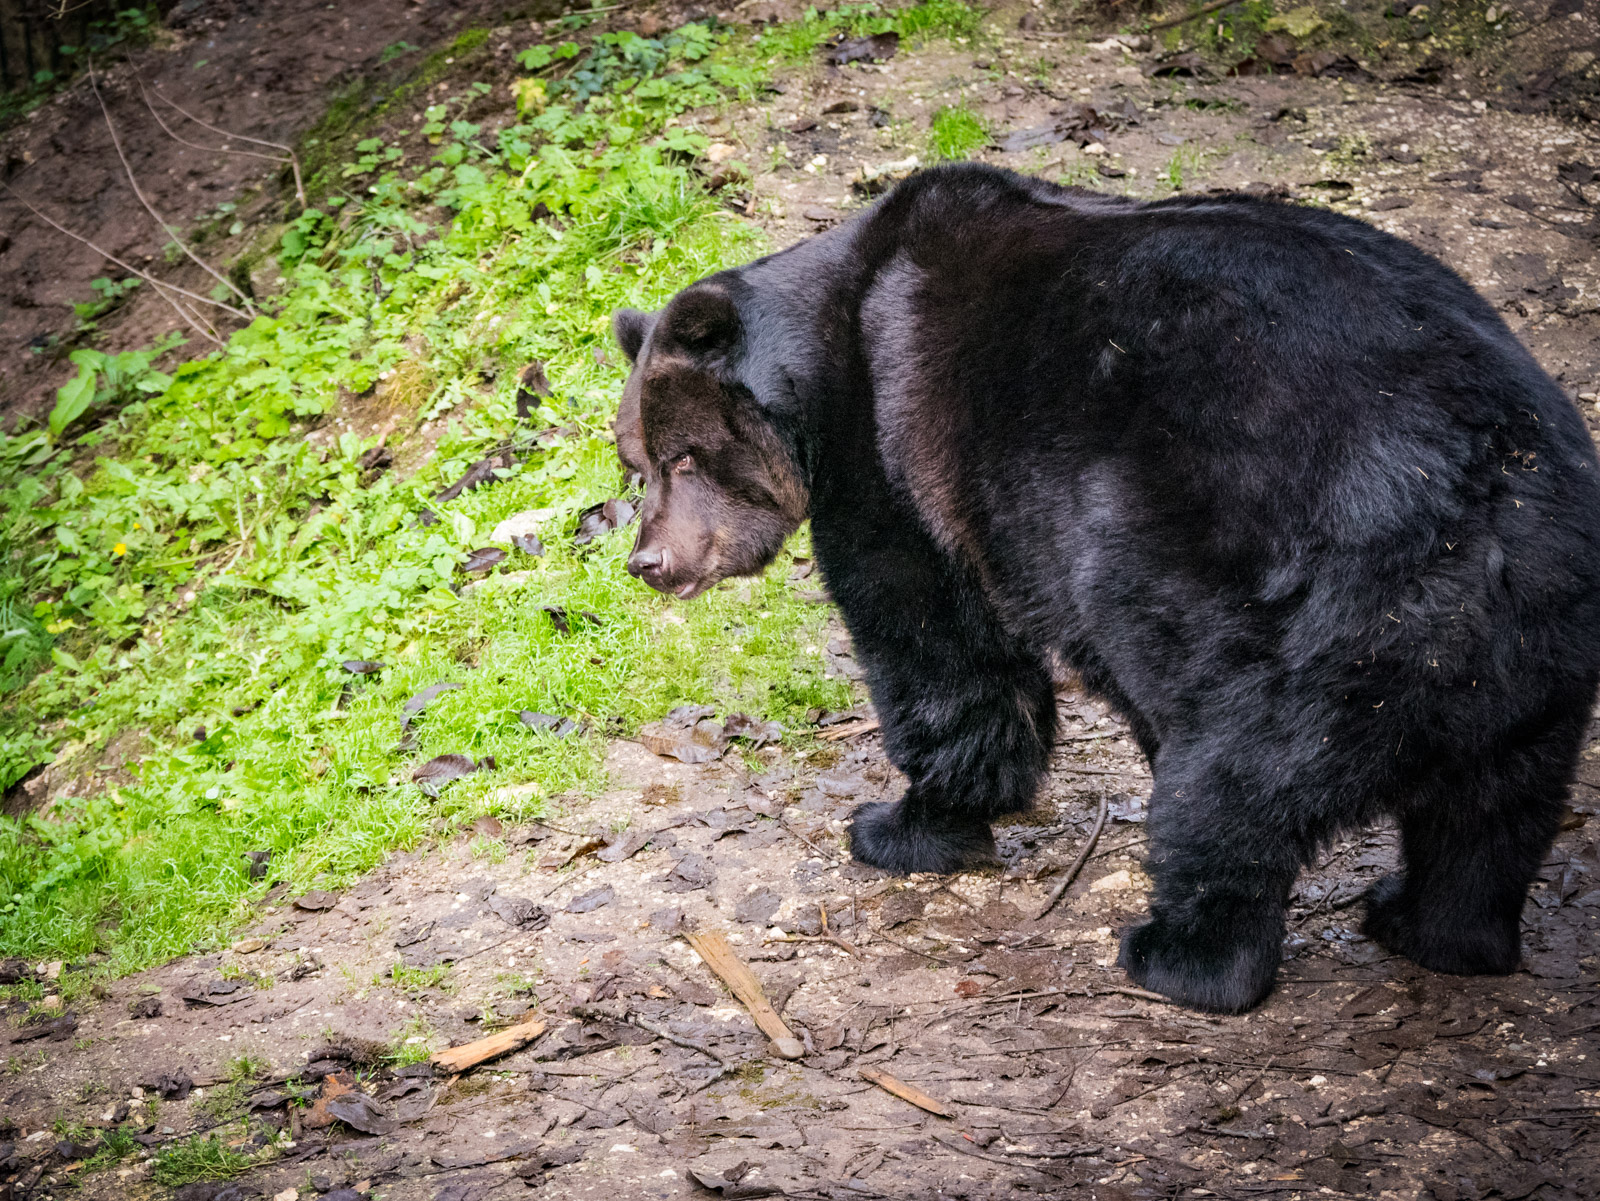 Braunbär Bruno der Bär von San Romedio